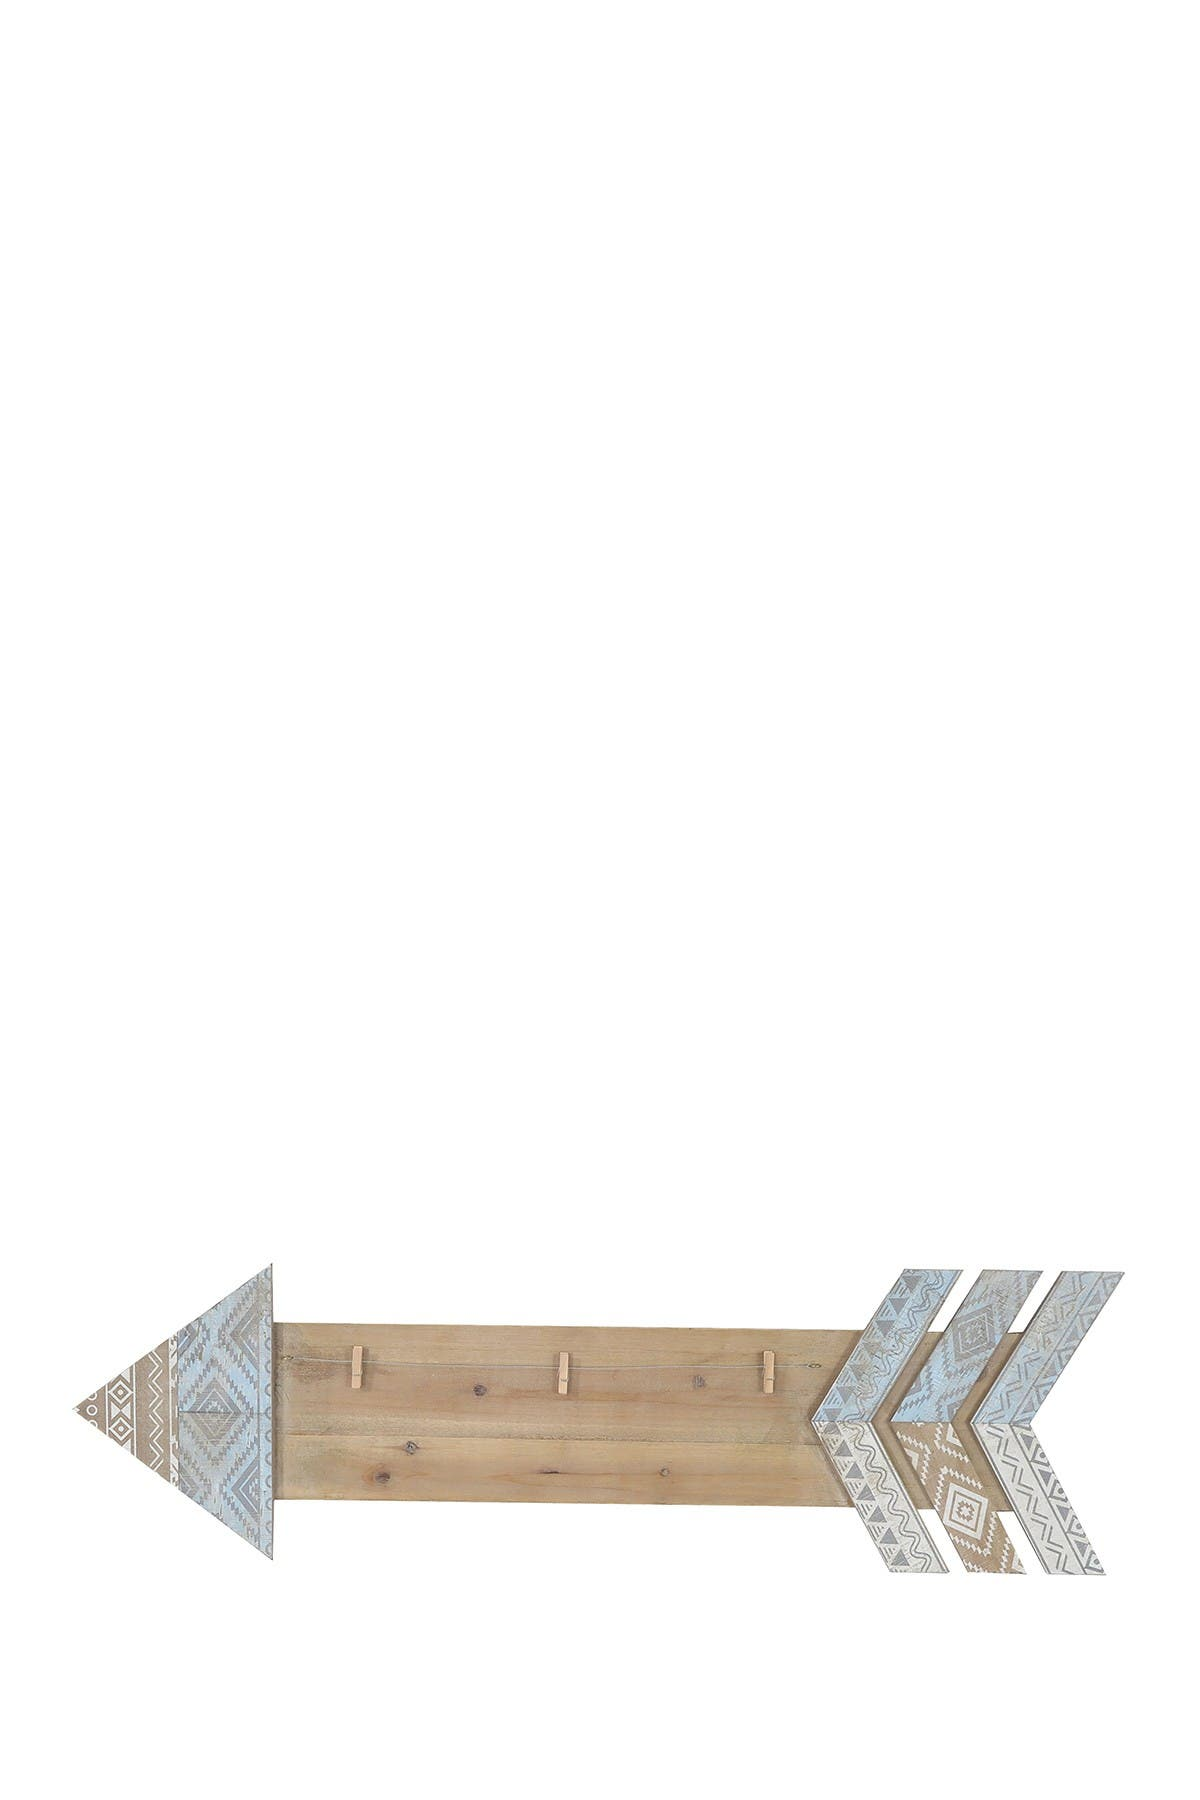 Image of SAGEBROOK HOME Brown/Silver Wood Arrow Memo Board